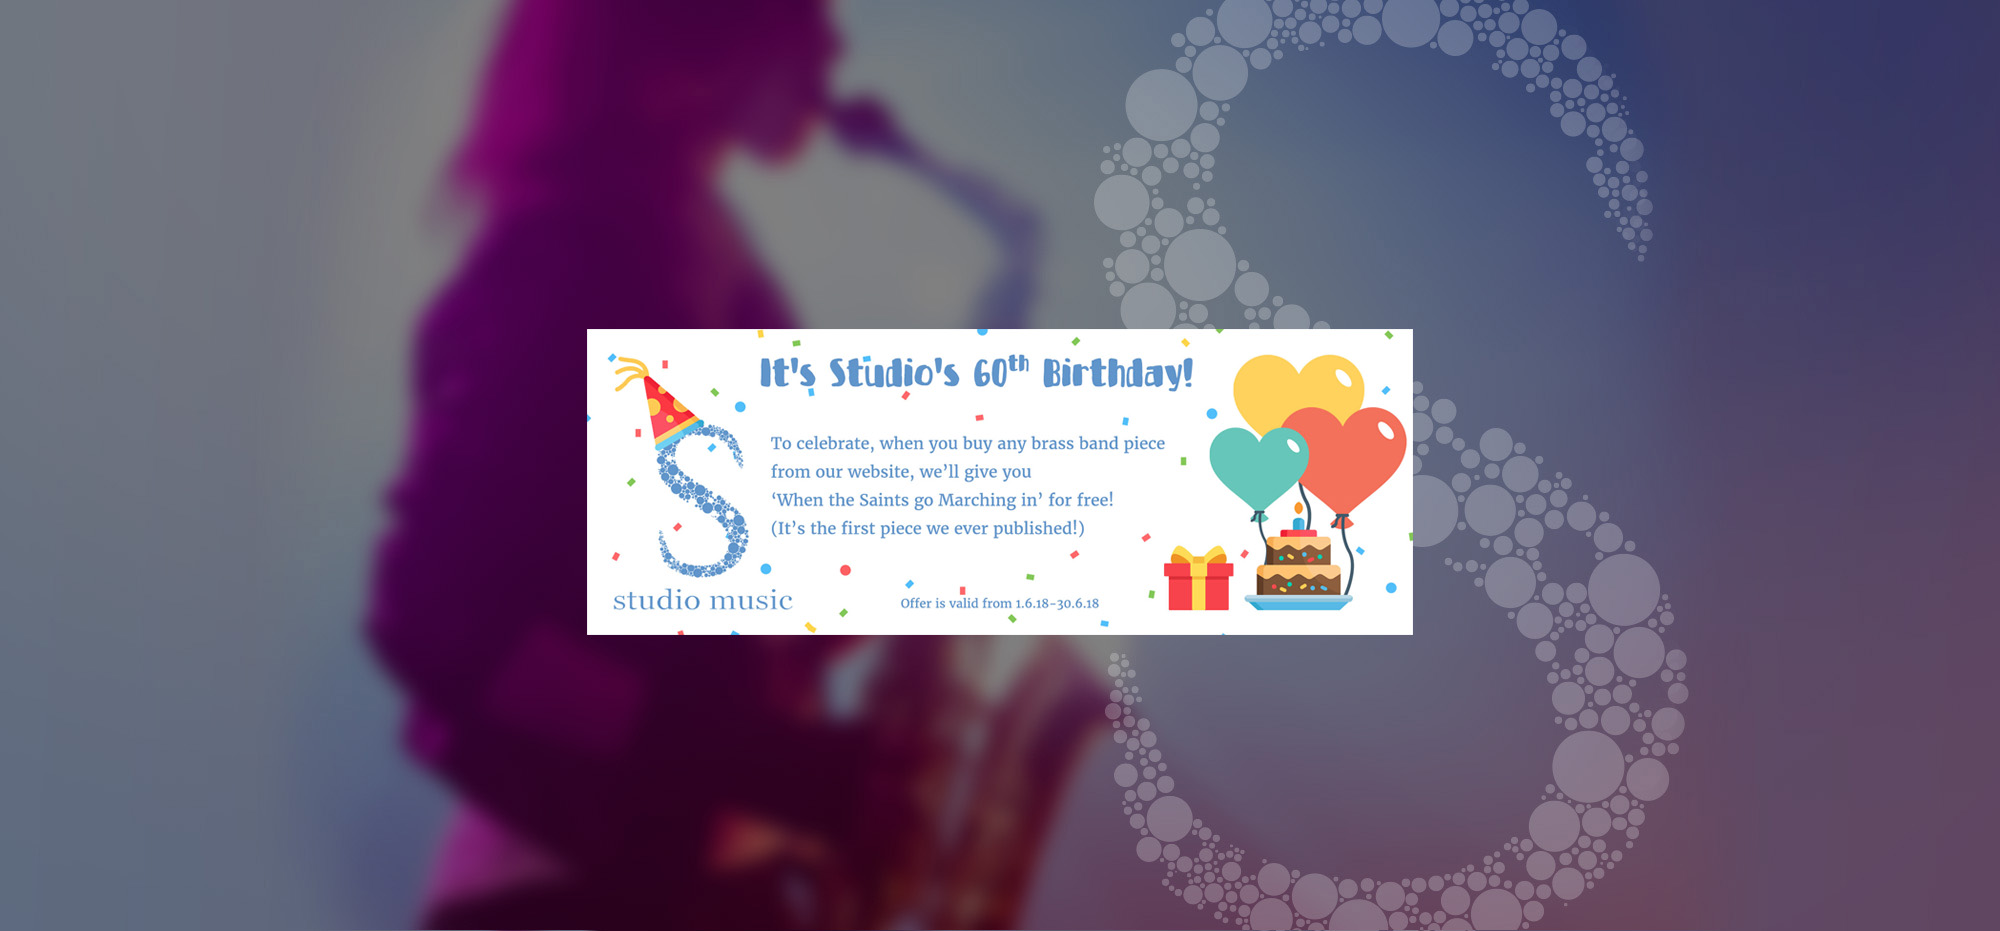 Studios birthday